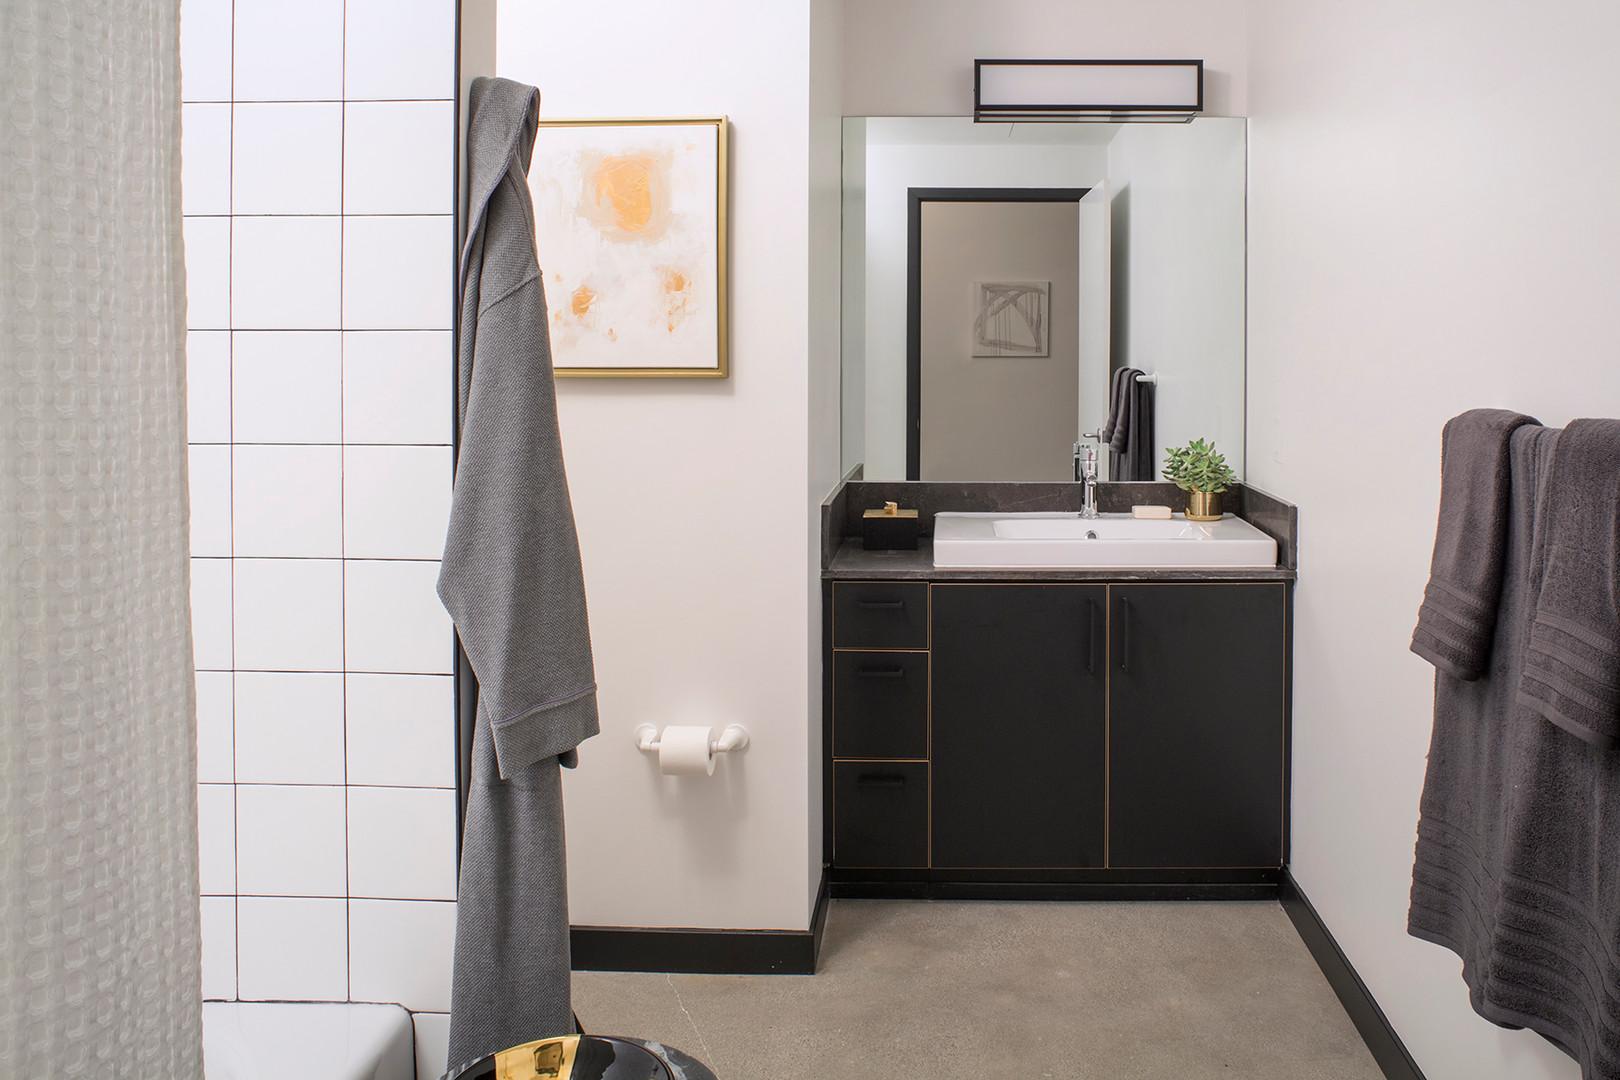 Edison Long Beach Industrial Bathroom